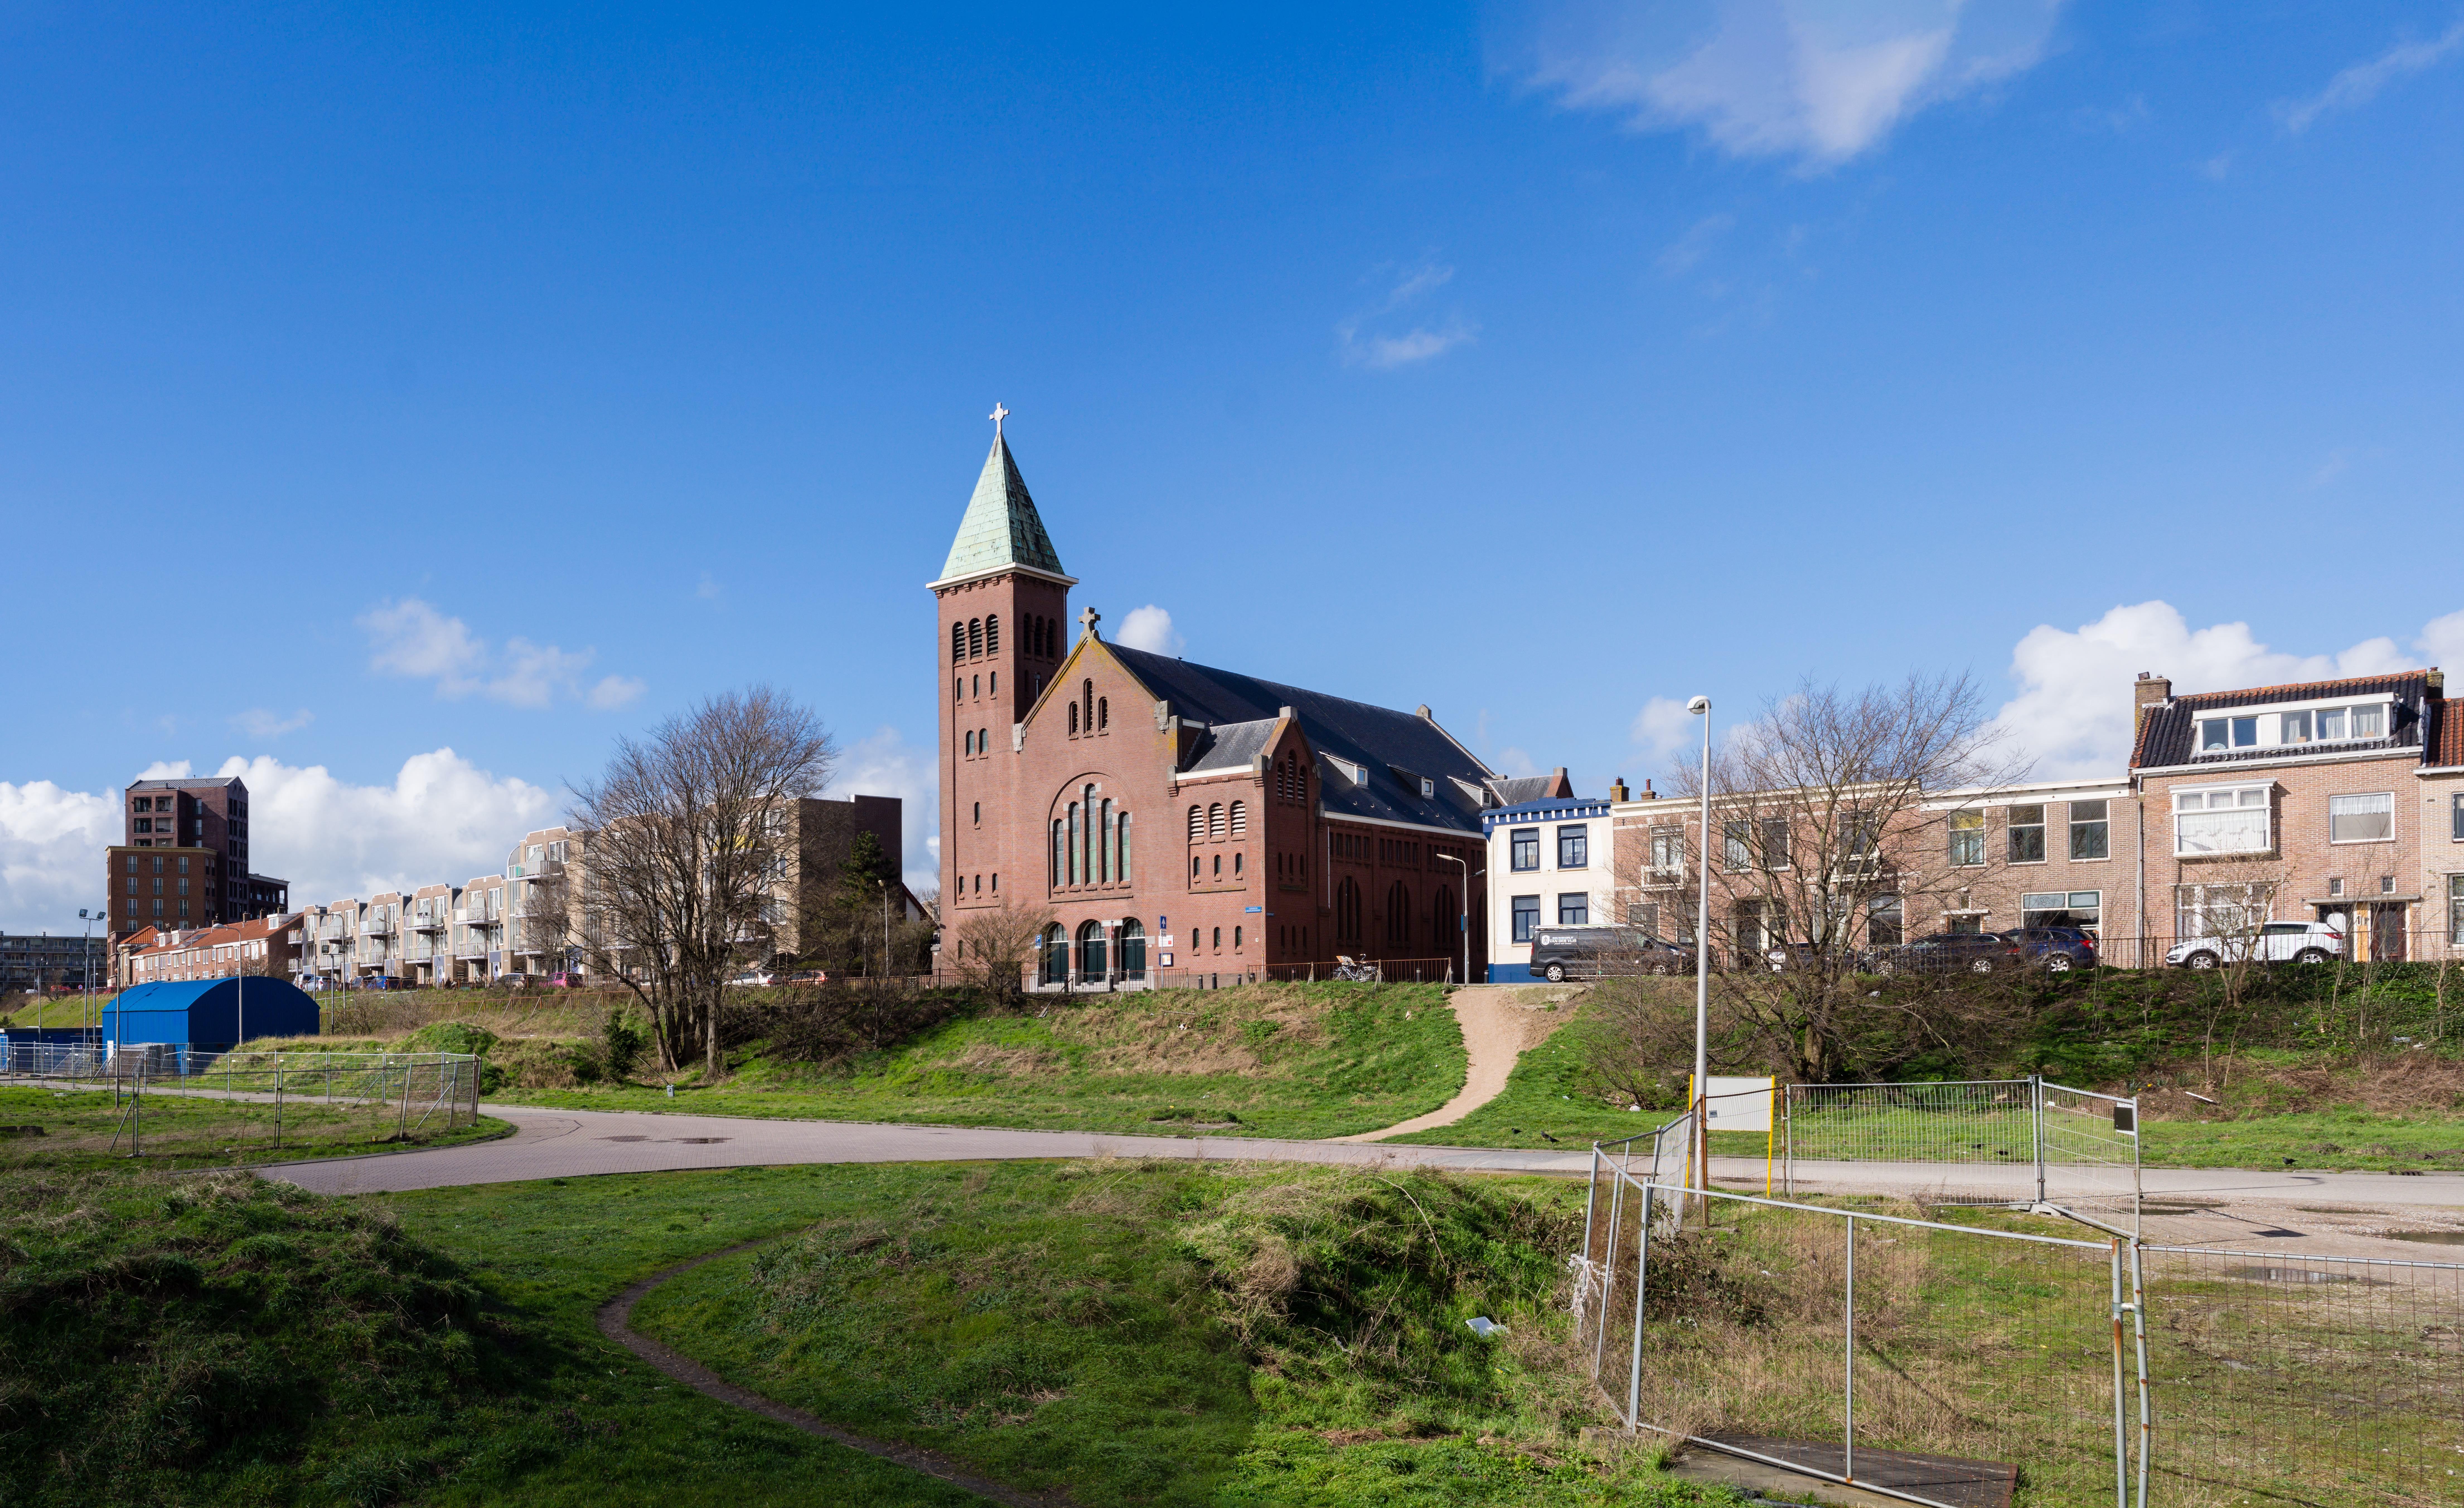 Kruitenstraat, IJmuiden